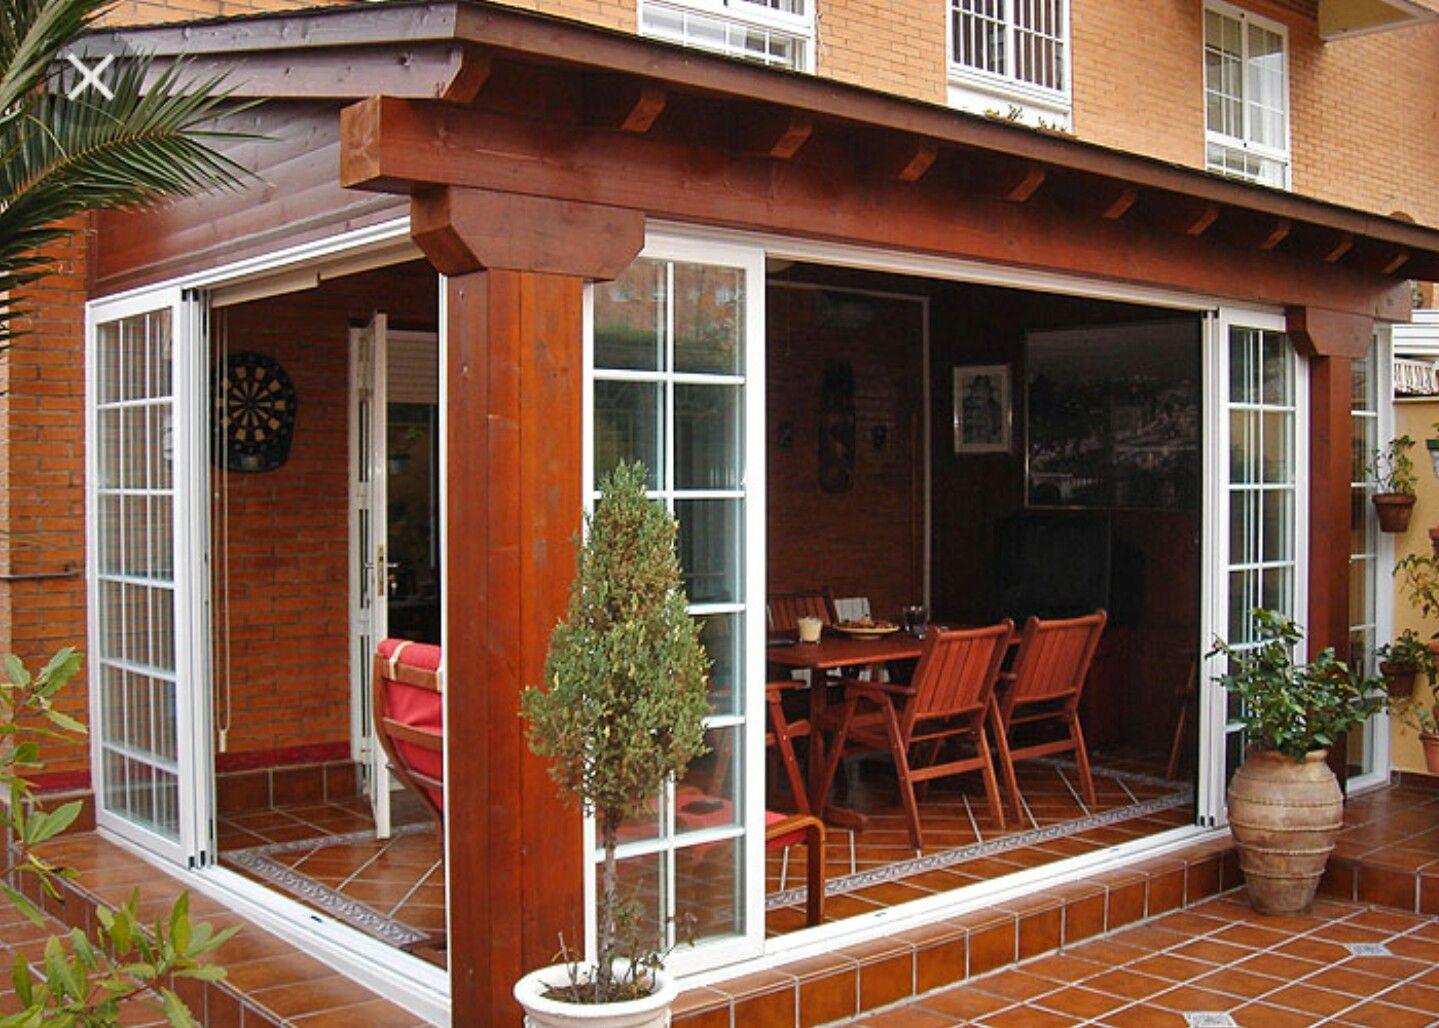 Cerramiento exterior yard pinterest terrazas casas - Porches de madera cerrados ...